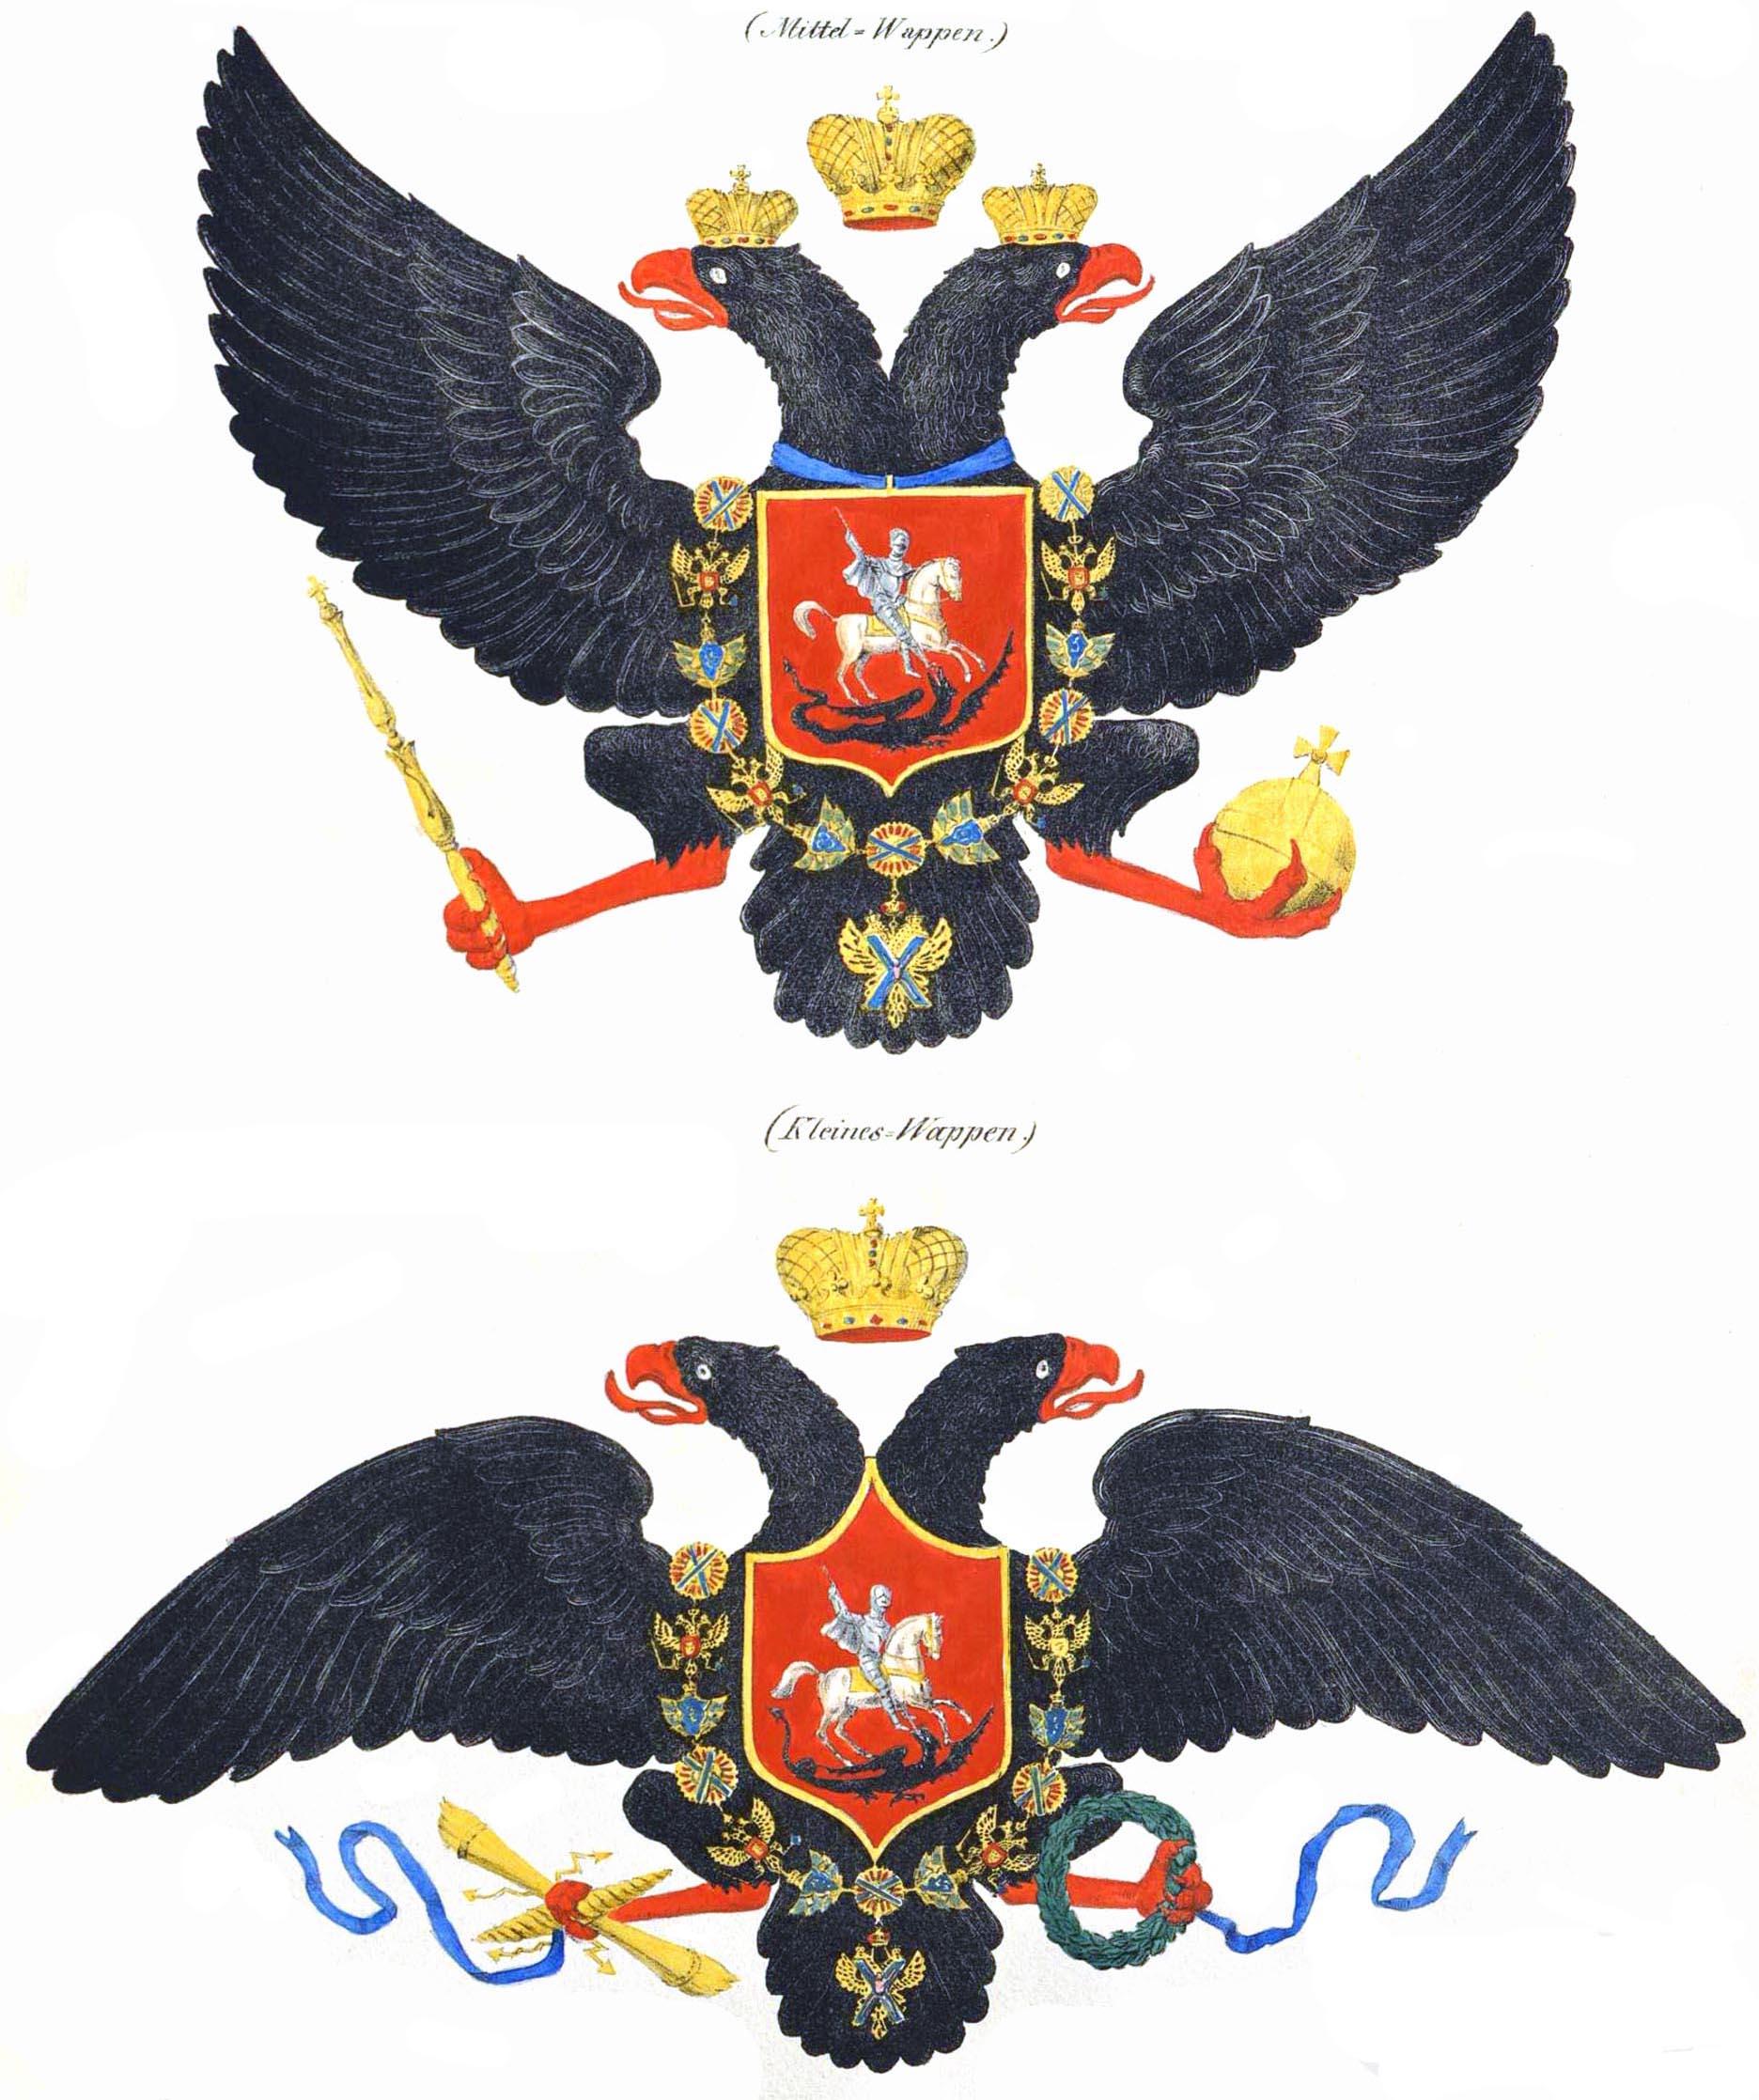 002. Russland. Mittel = Wappen. Kleines = Wappen. / Россия средний и малый герб.